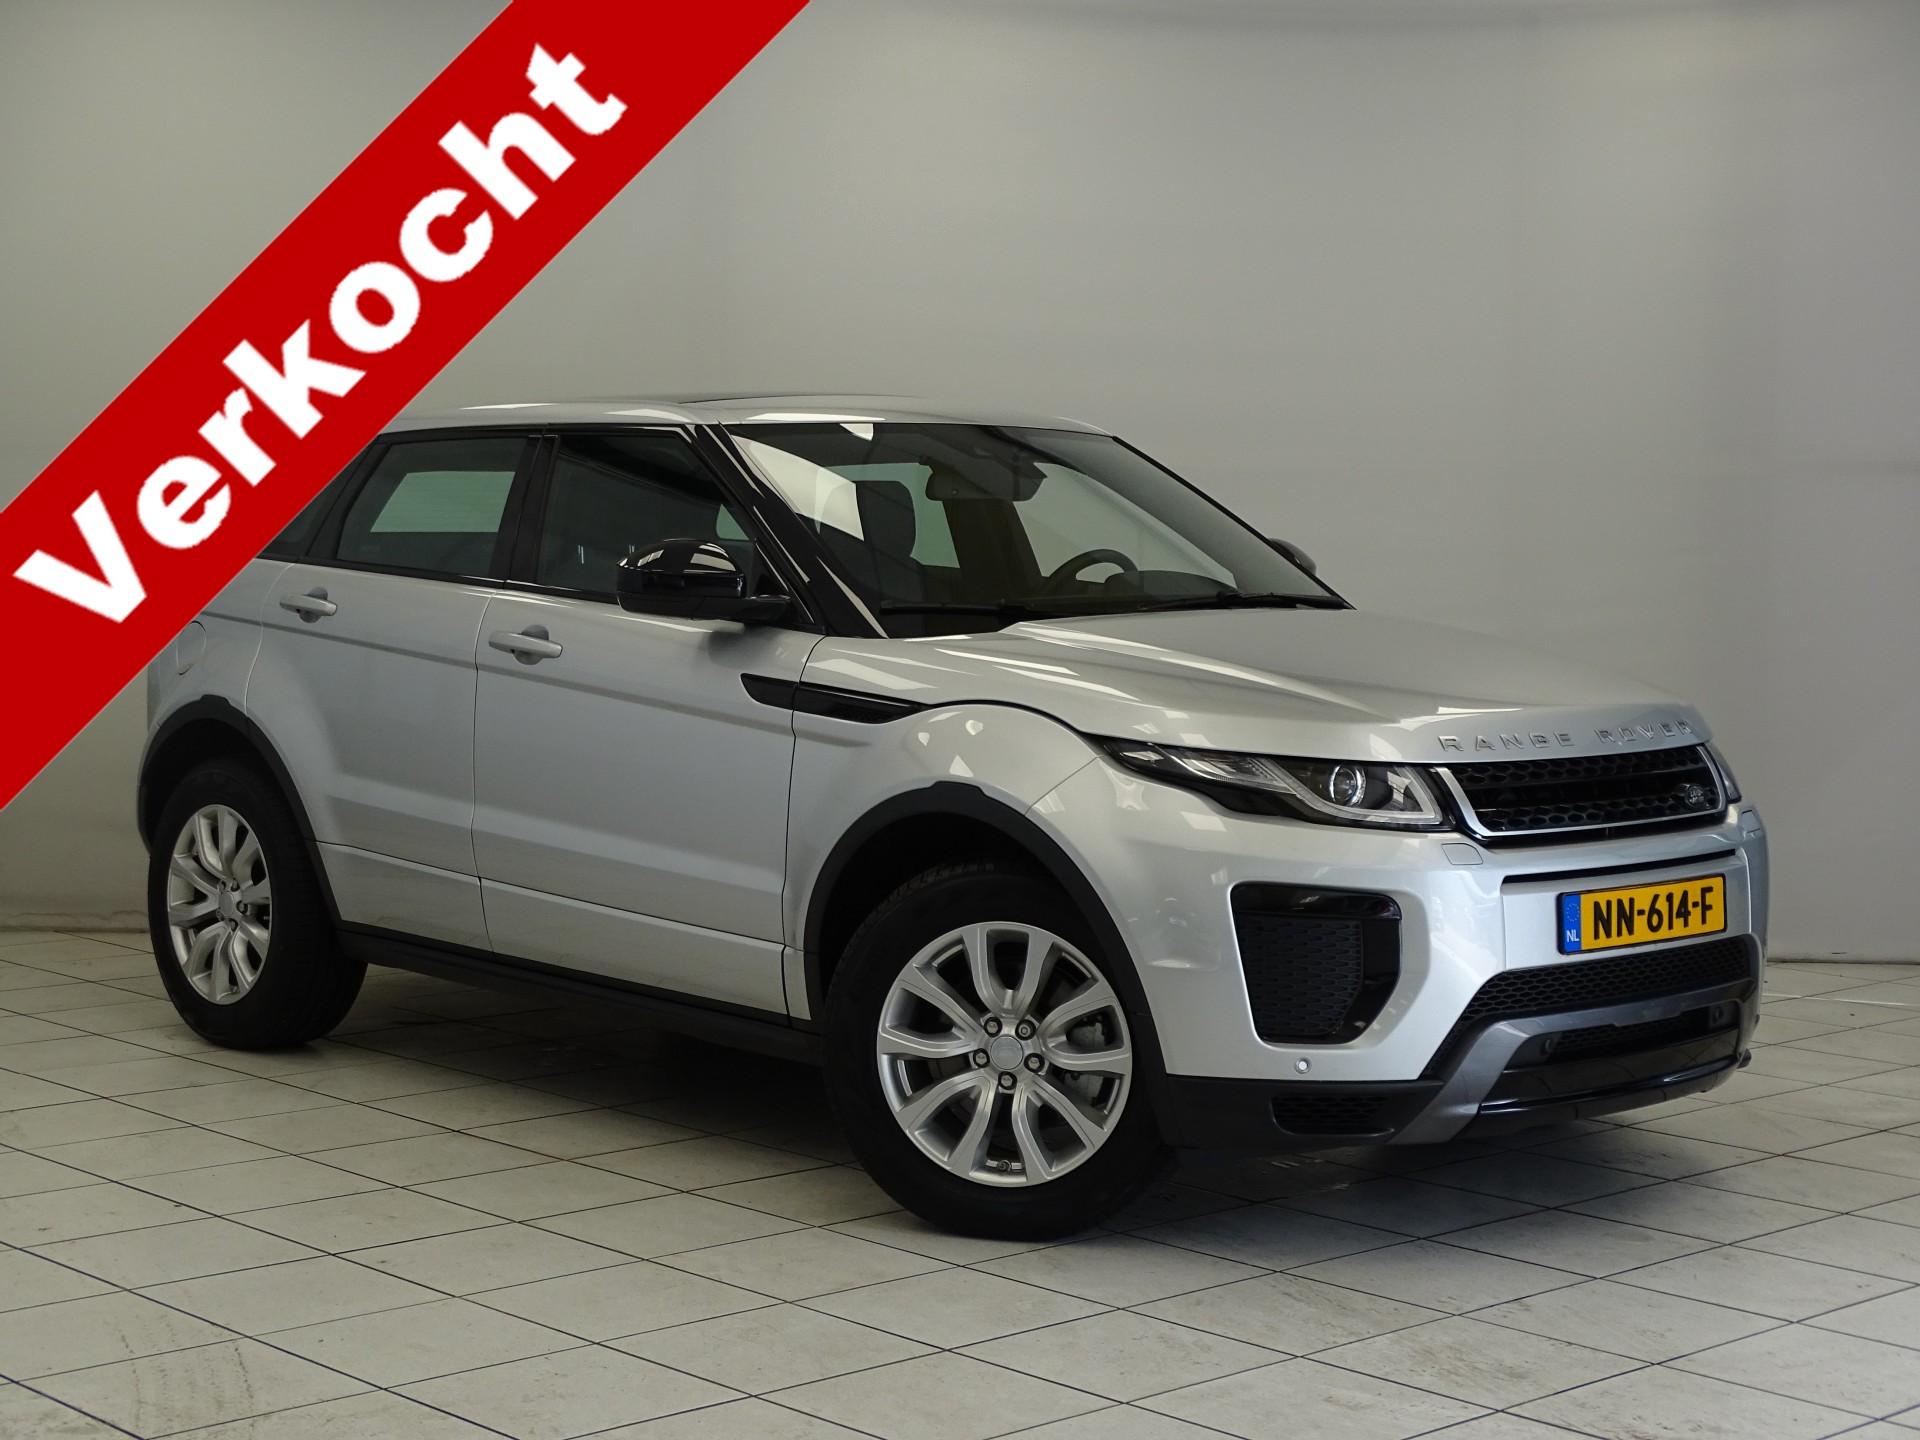 Land Rover Range Rover Evoque | Onlineautoleasen.nl